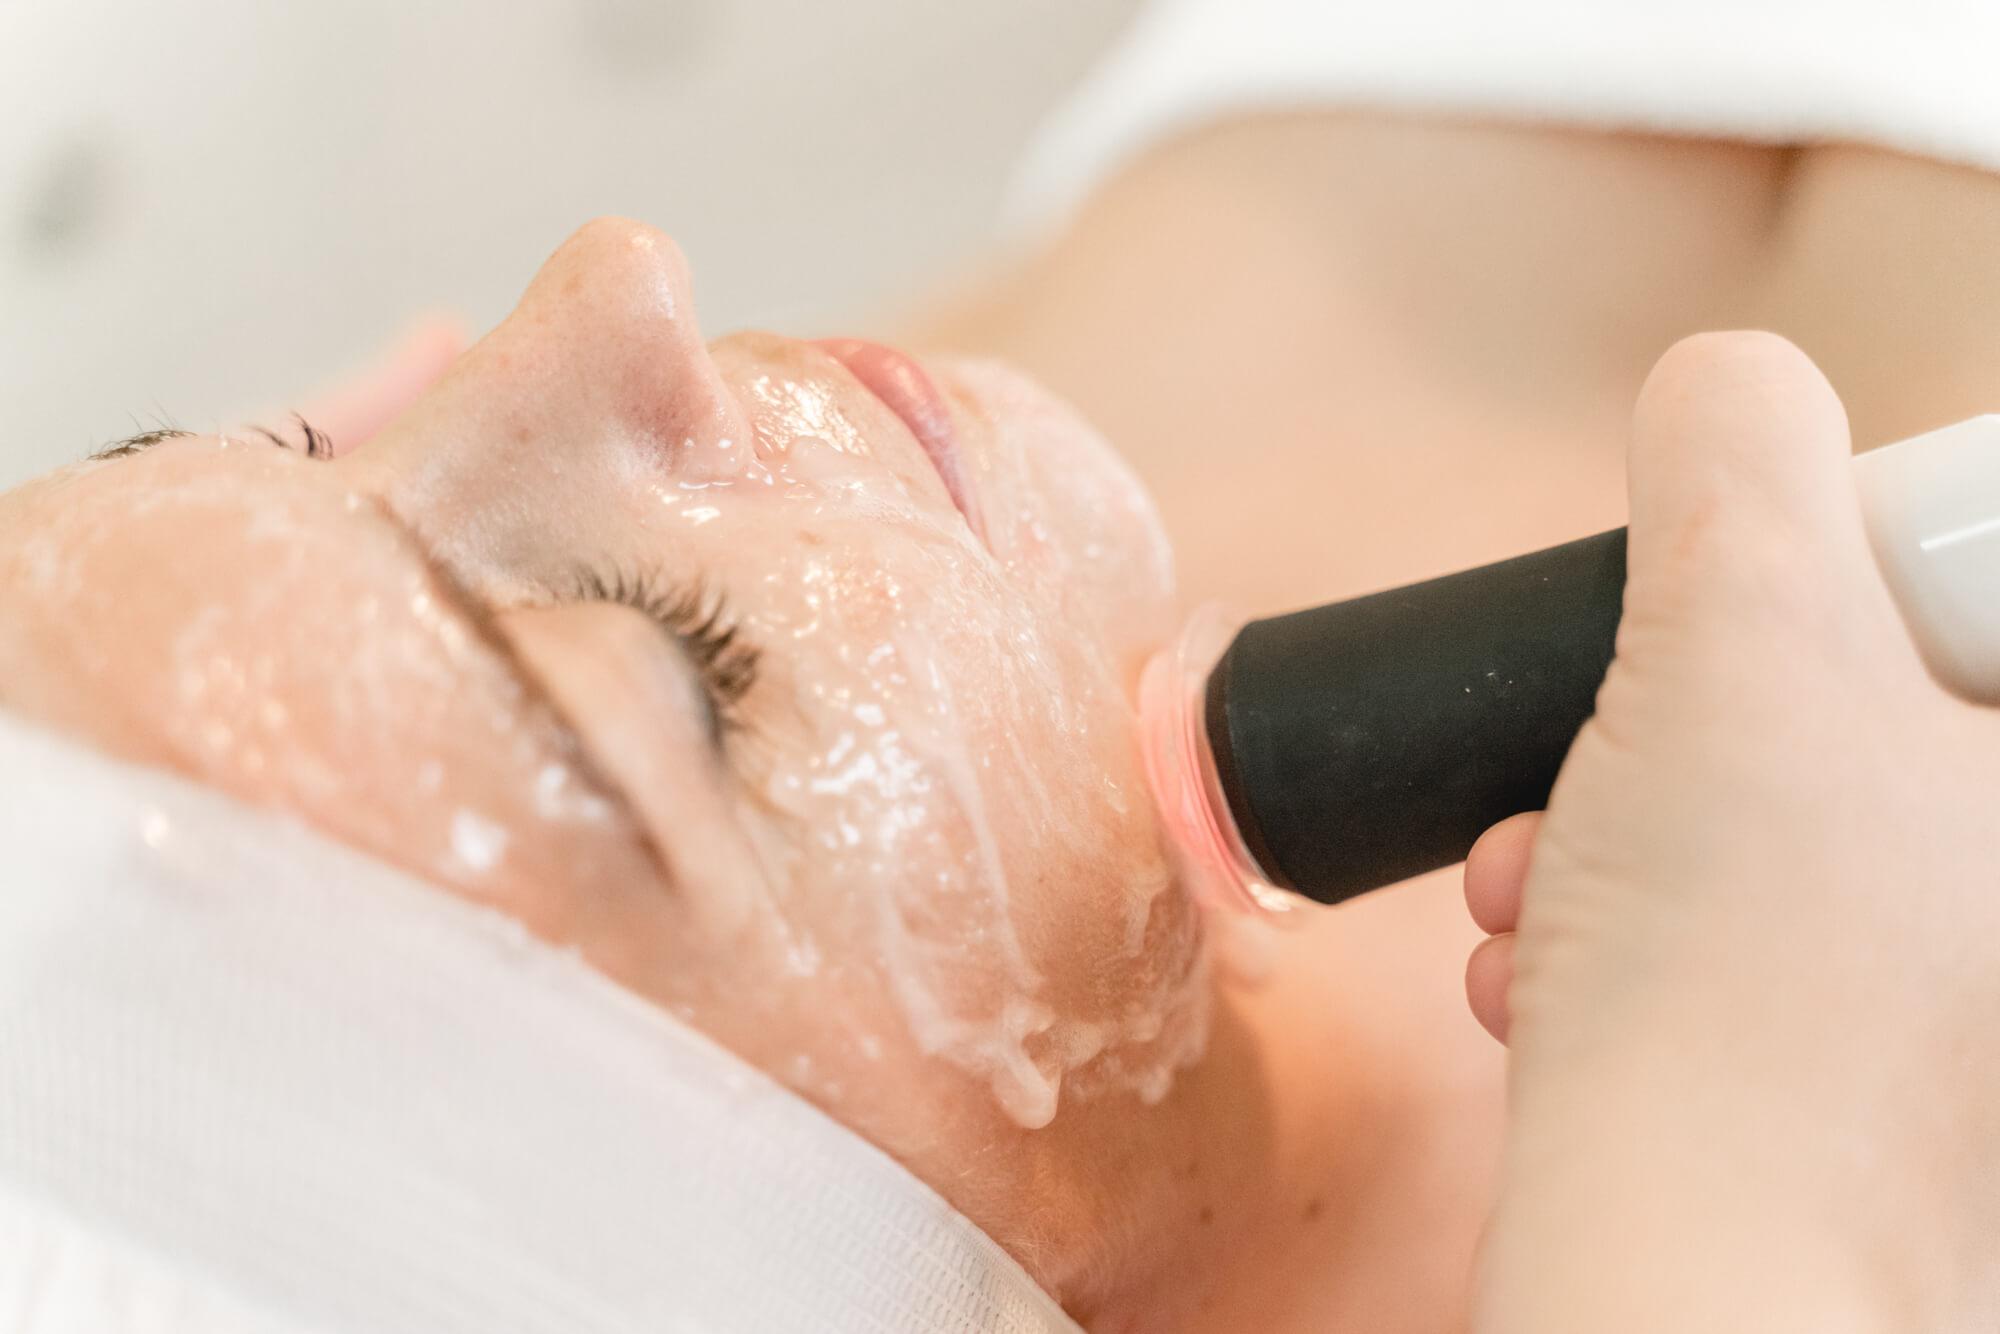 Kosmetik_Driller_Kosmetikstudio_Bruchsal-147